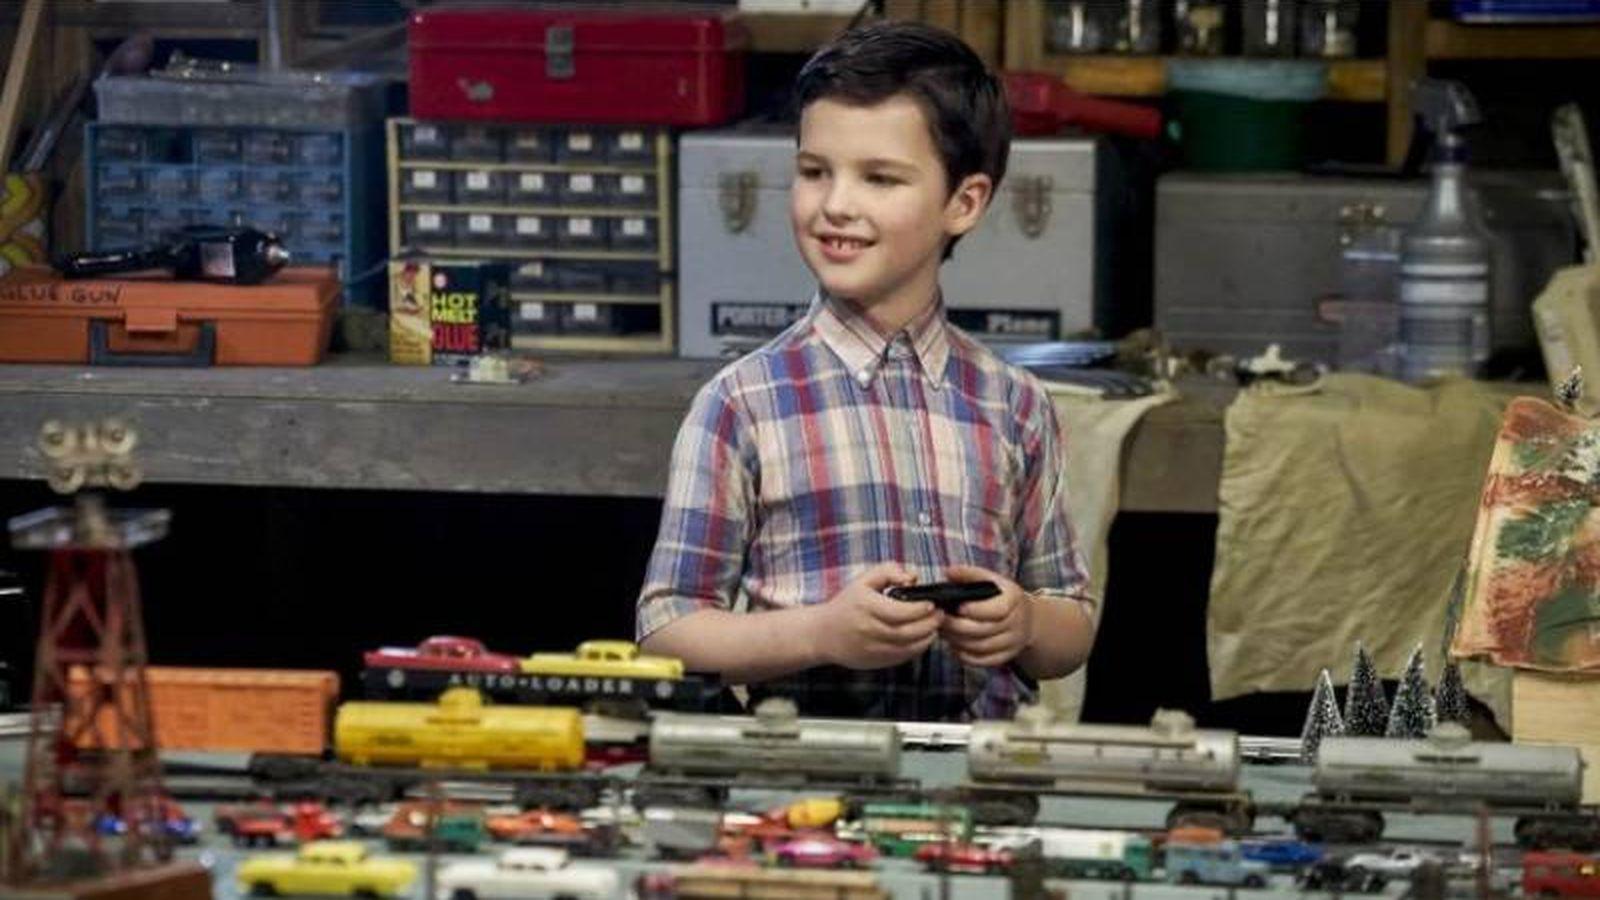 Foto: Iain Armitage como el joven Sheldon Cooper. (CBS)